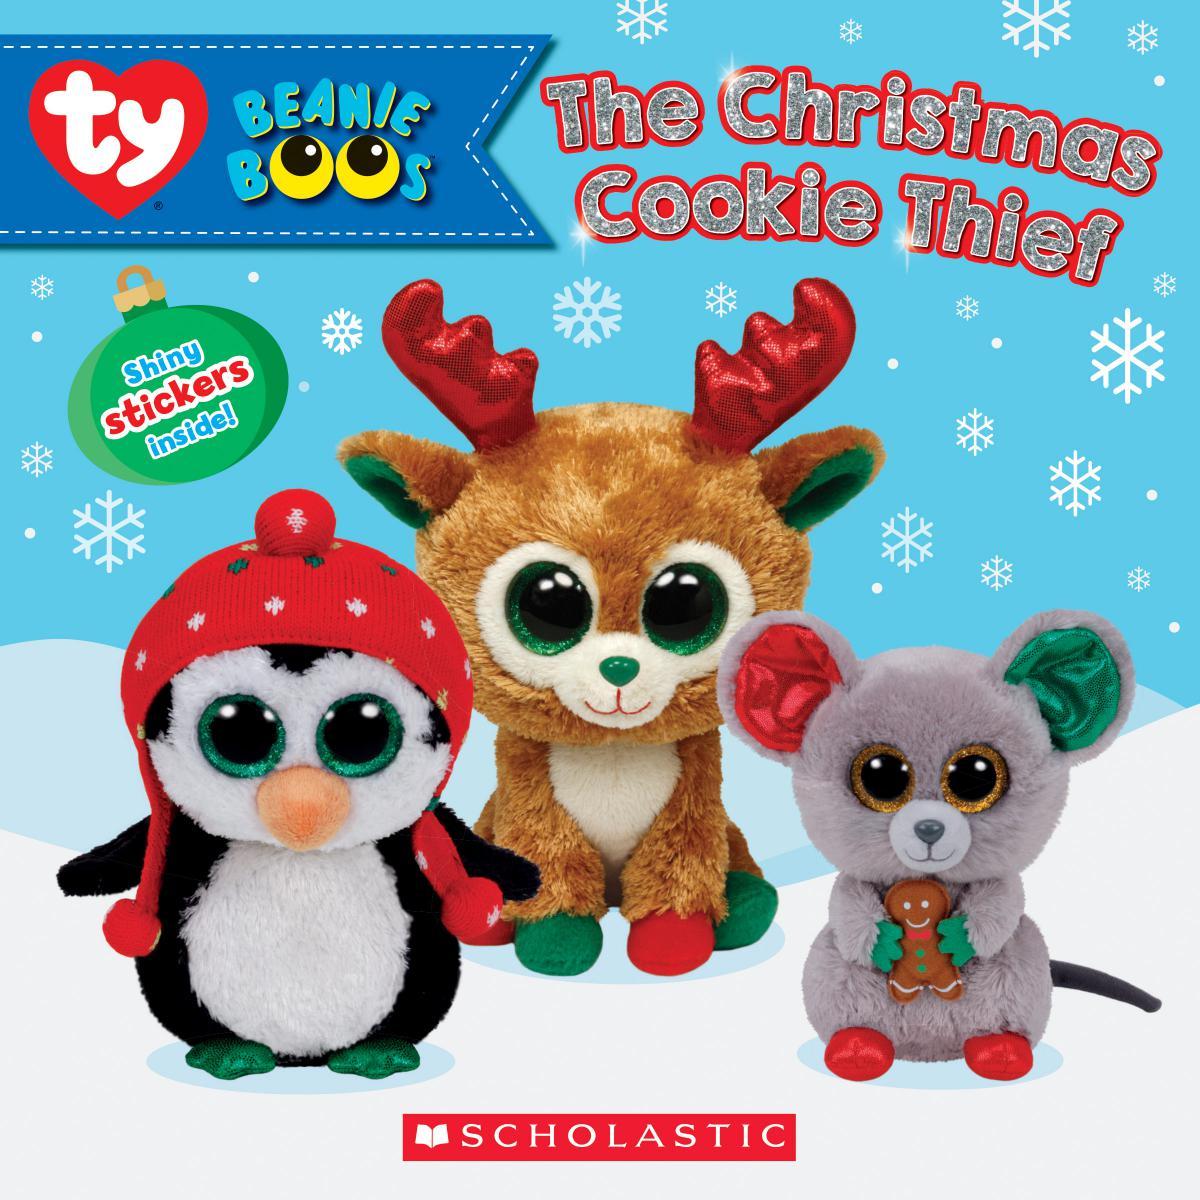 TY® Beanie Boos™: The Christmas Cookie Thief